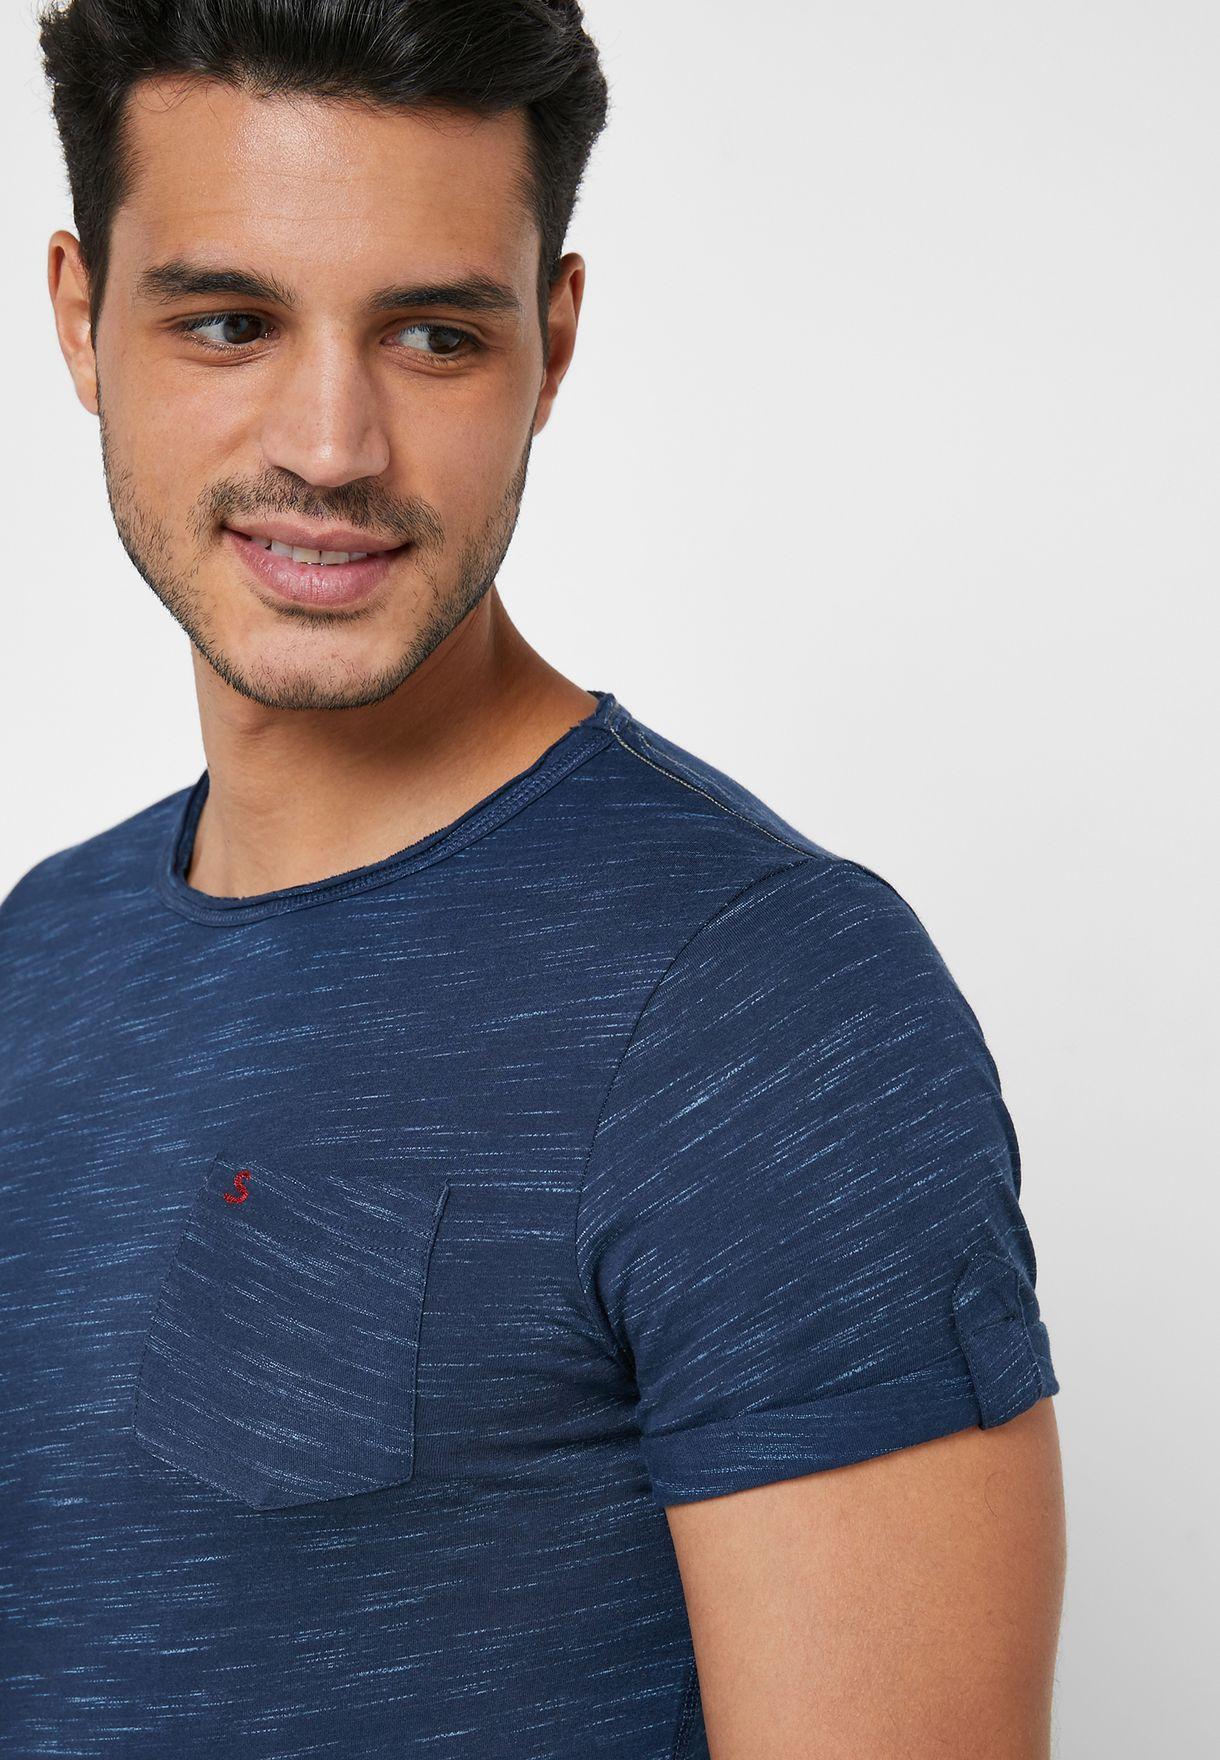 Textured Slim Fit Crew Neck T-Shirt